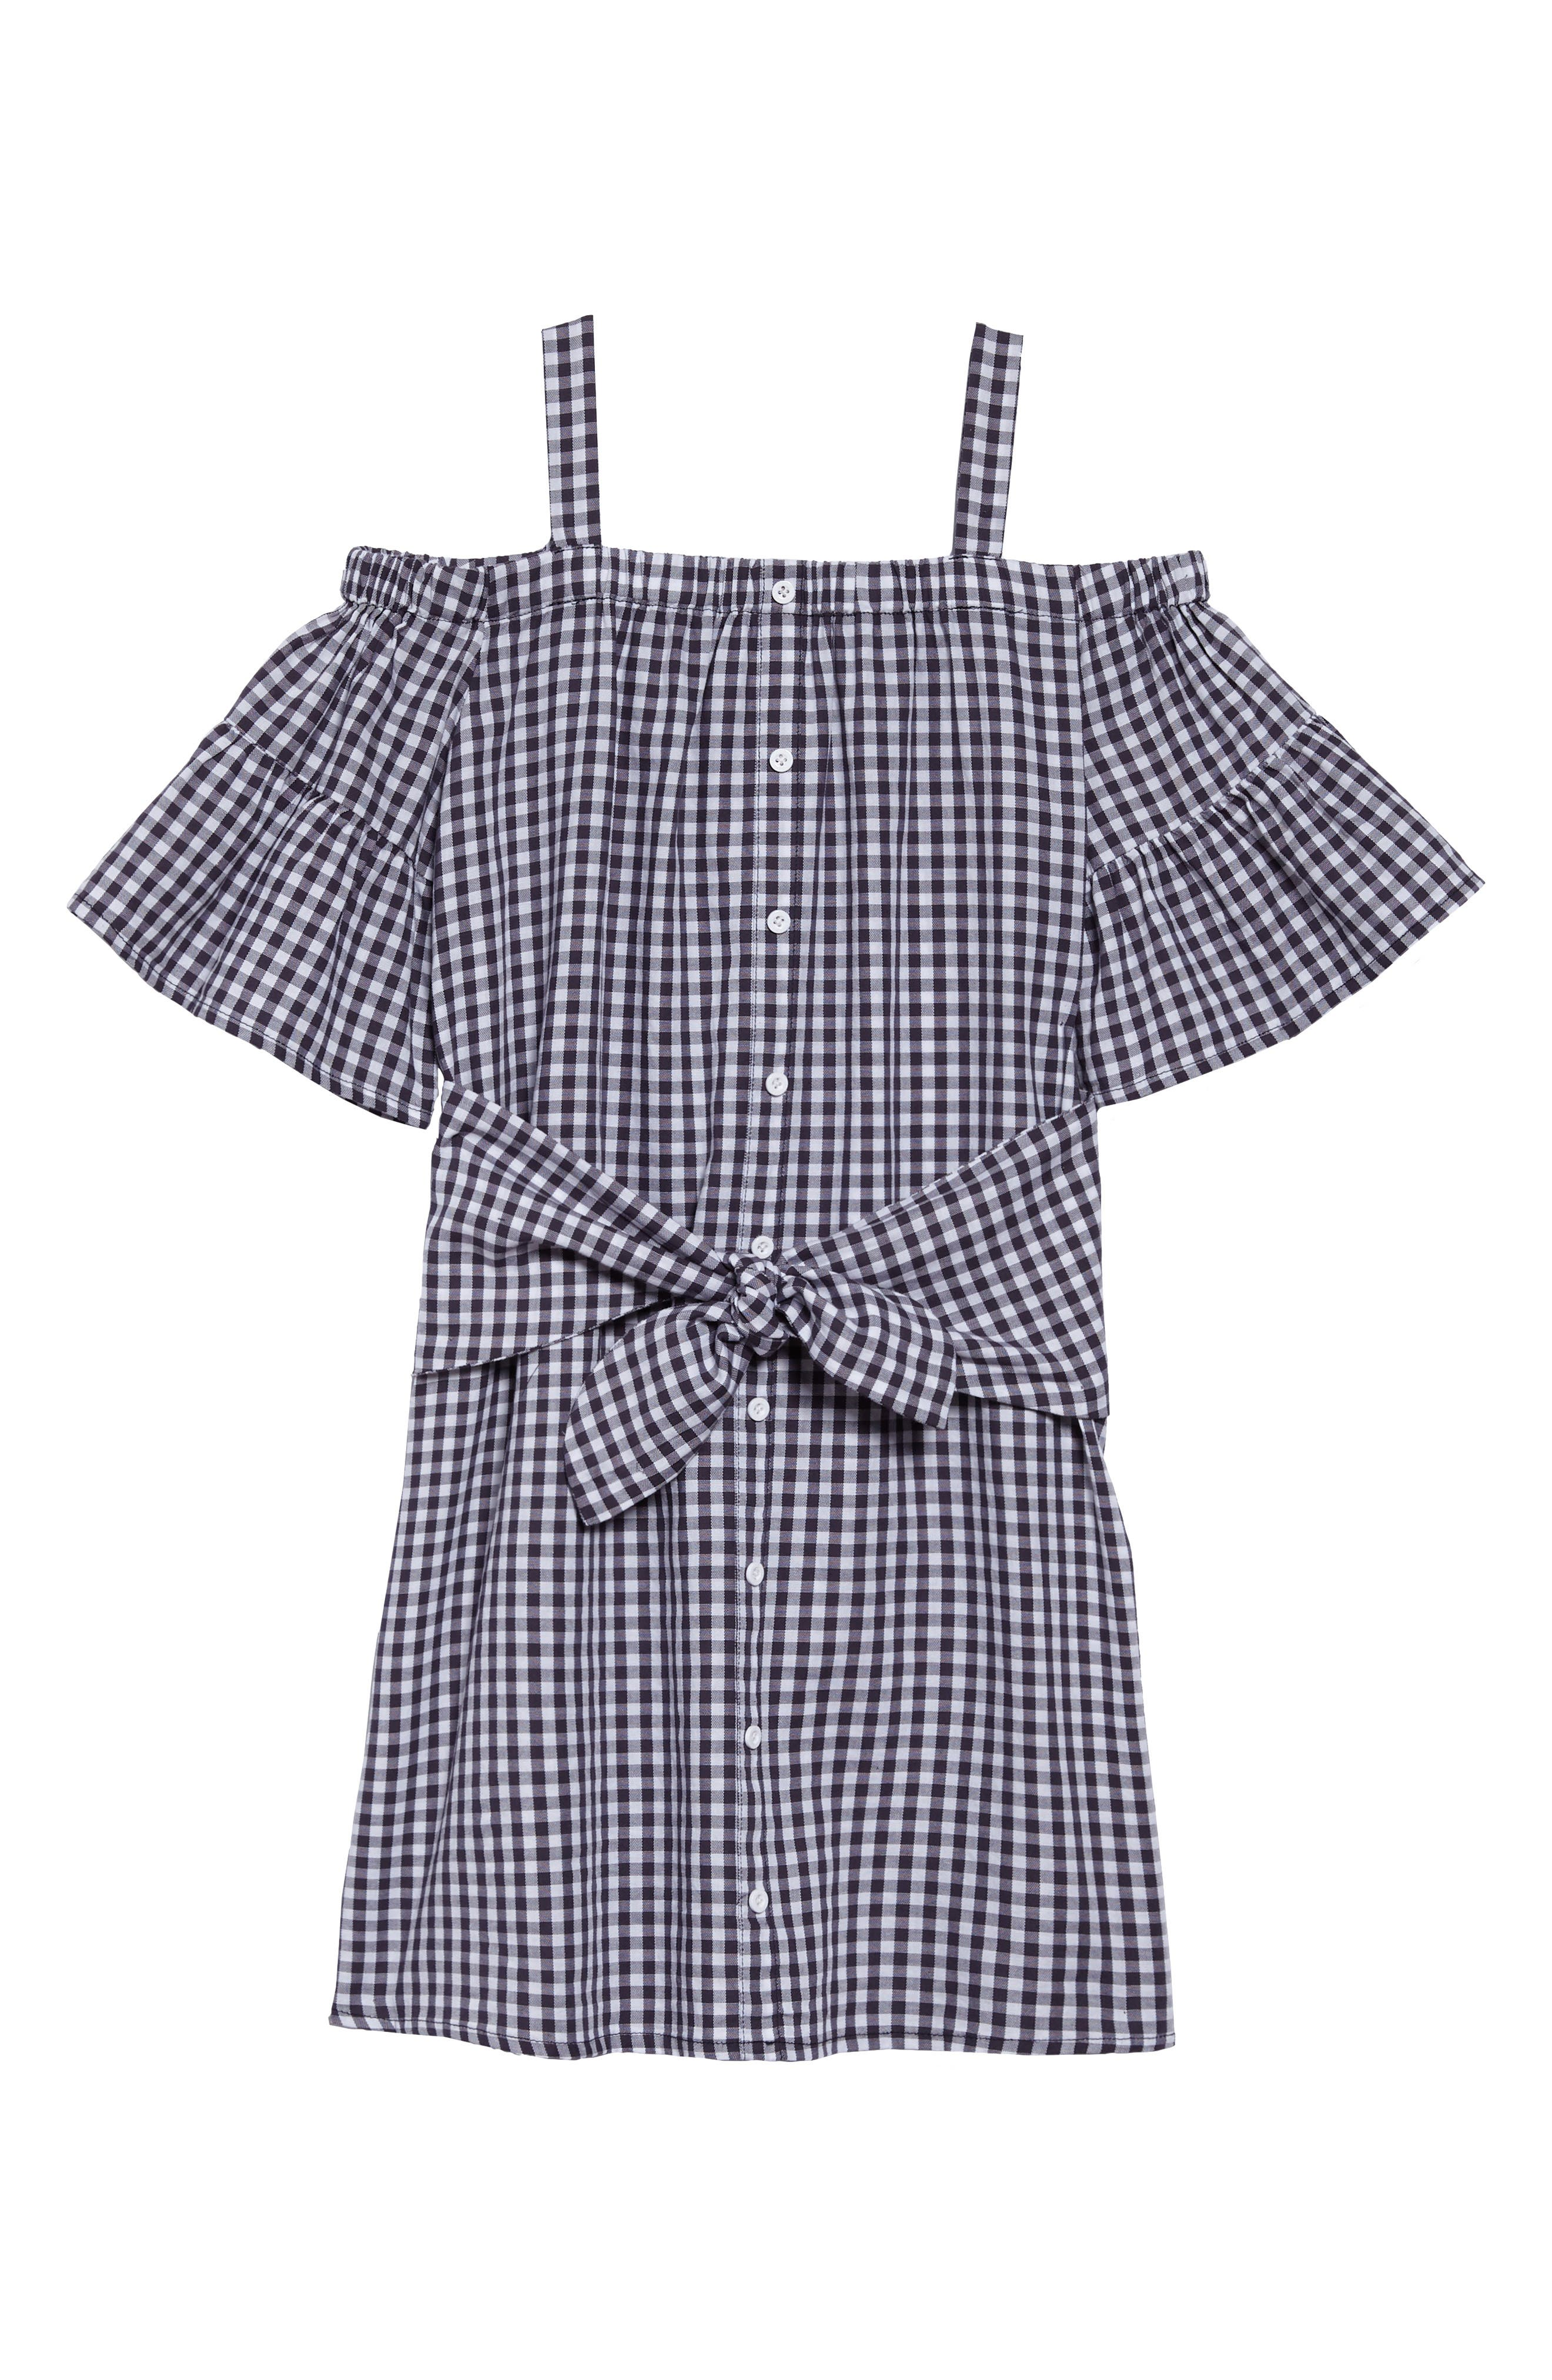 Jenny Check Cold Shoulder Dress,                             Main thumbnail 1, color,                             Plaid